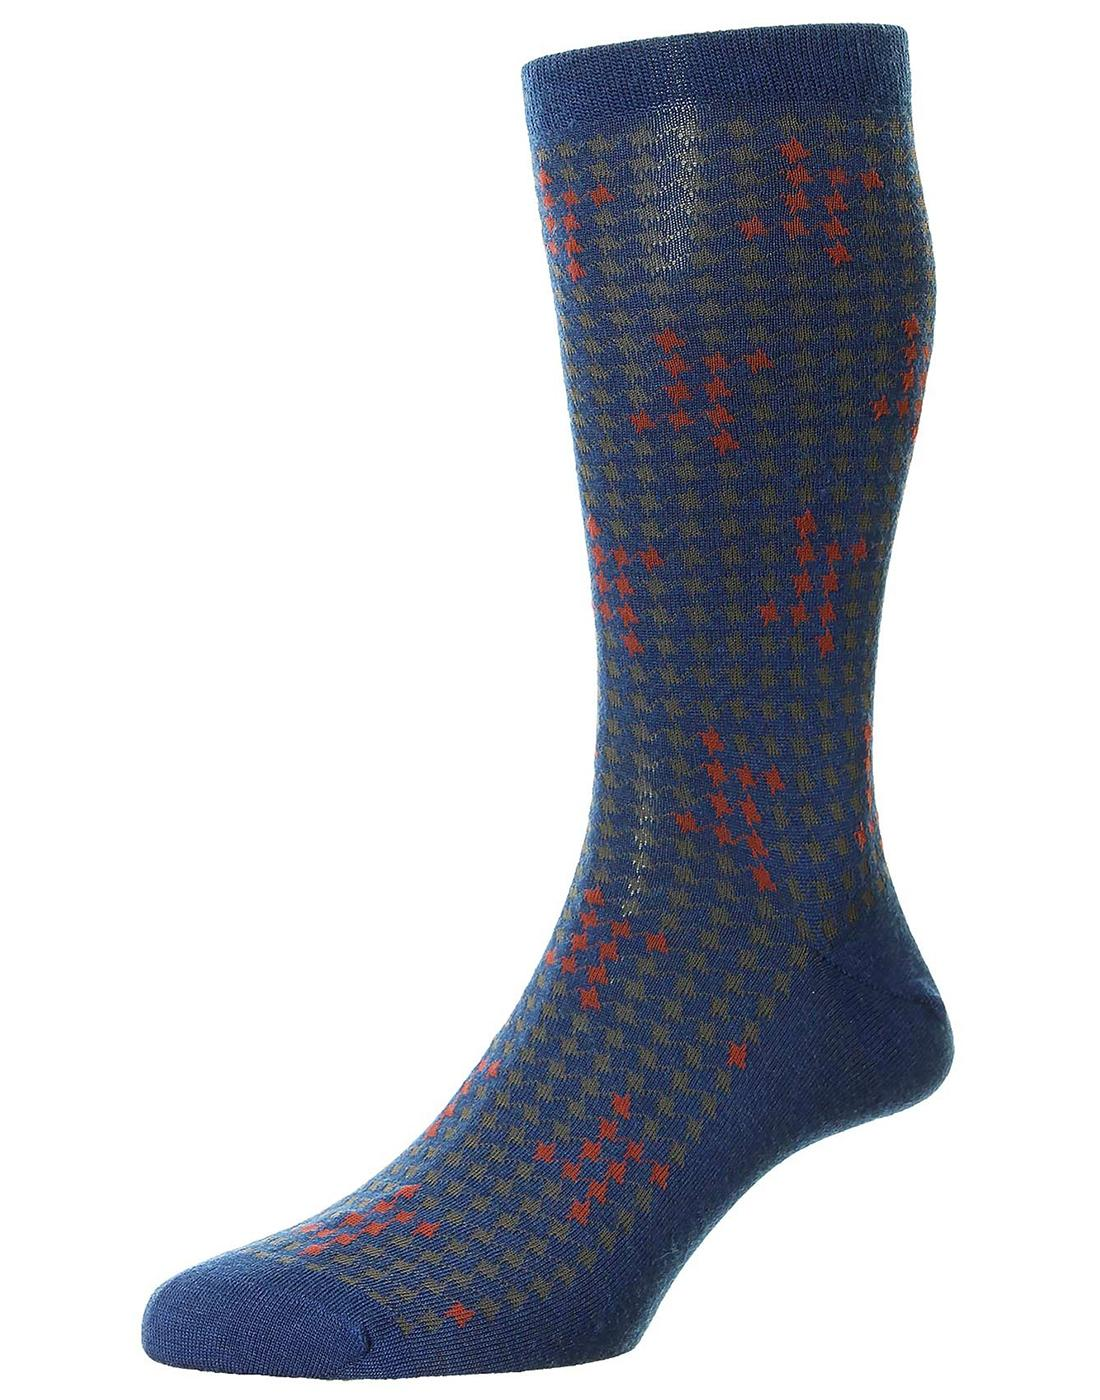 +Hopton PANTHERELLA Mod Houndstooth Merino Socks B